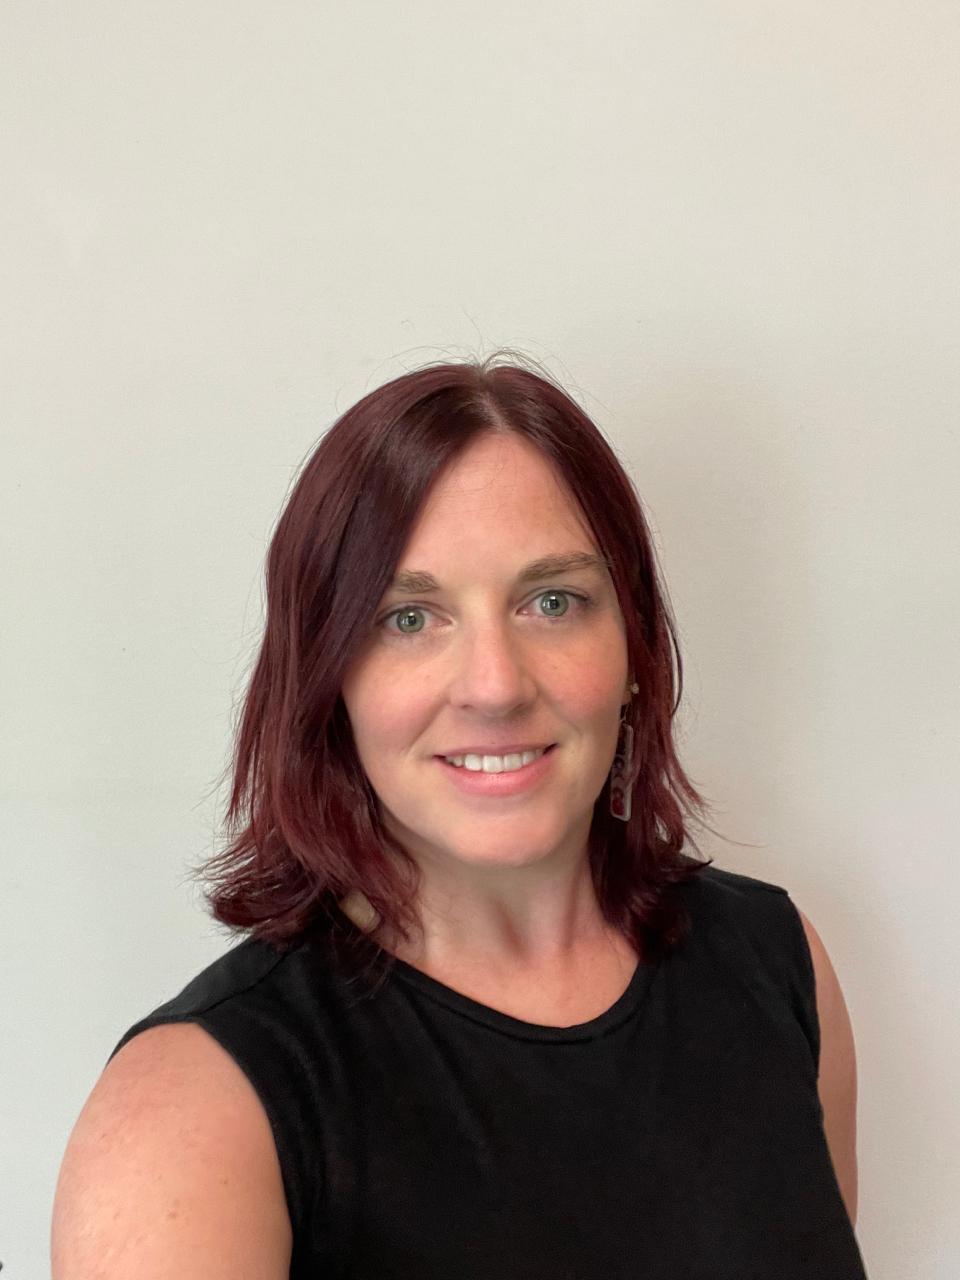 Profile picture of Kirsten Stevens